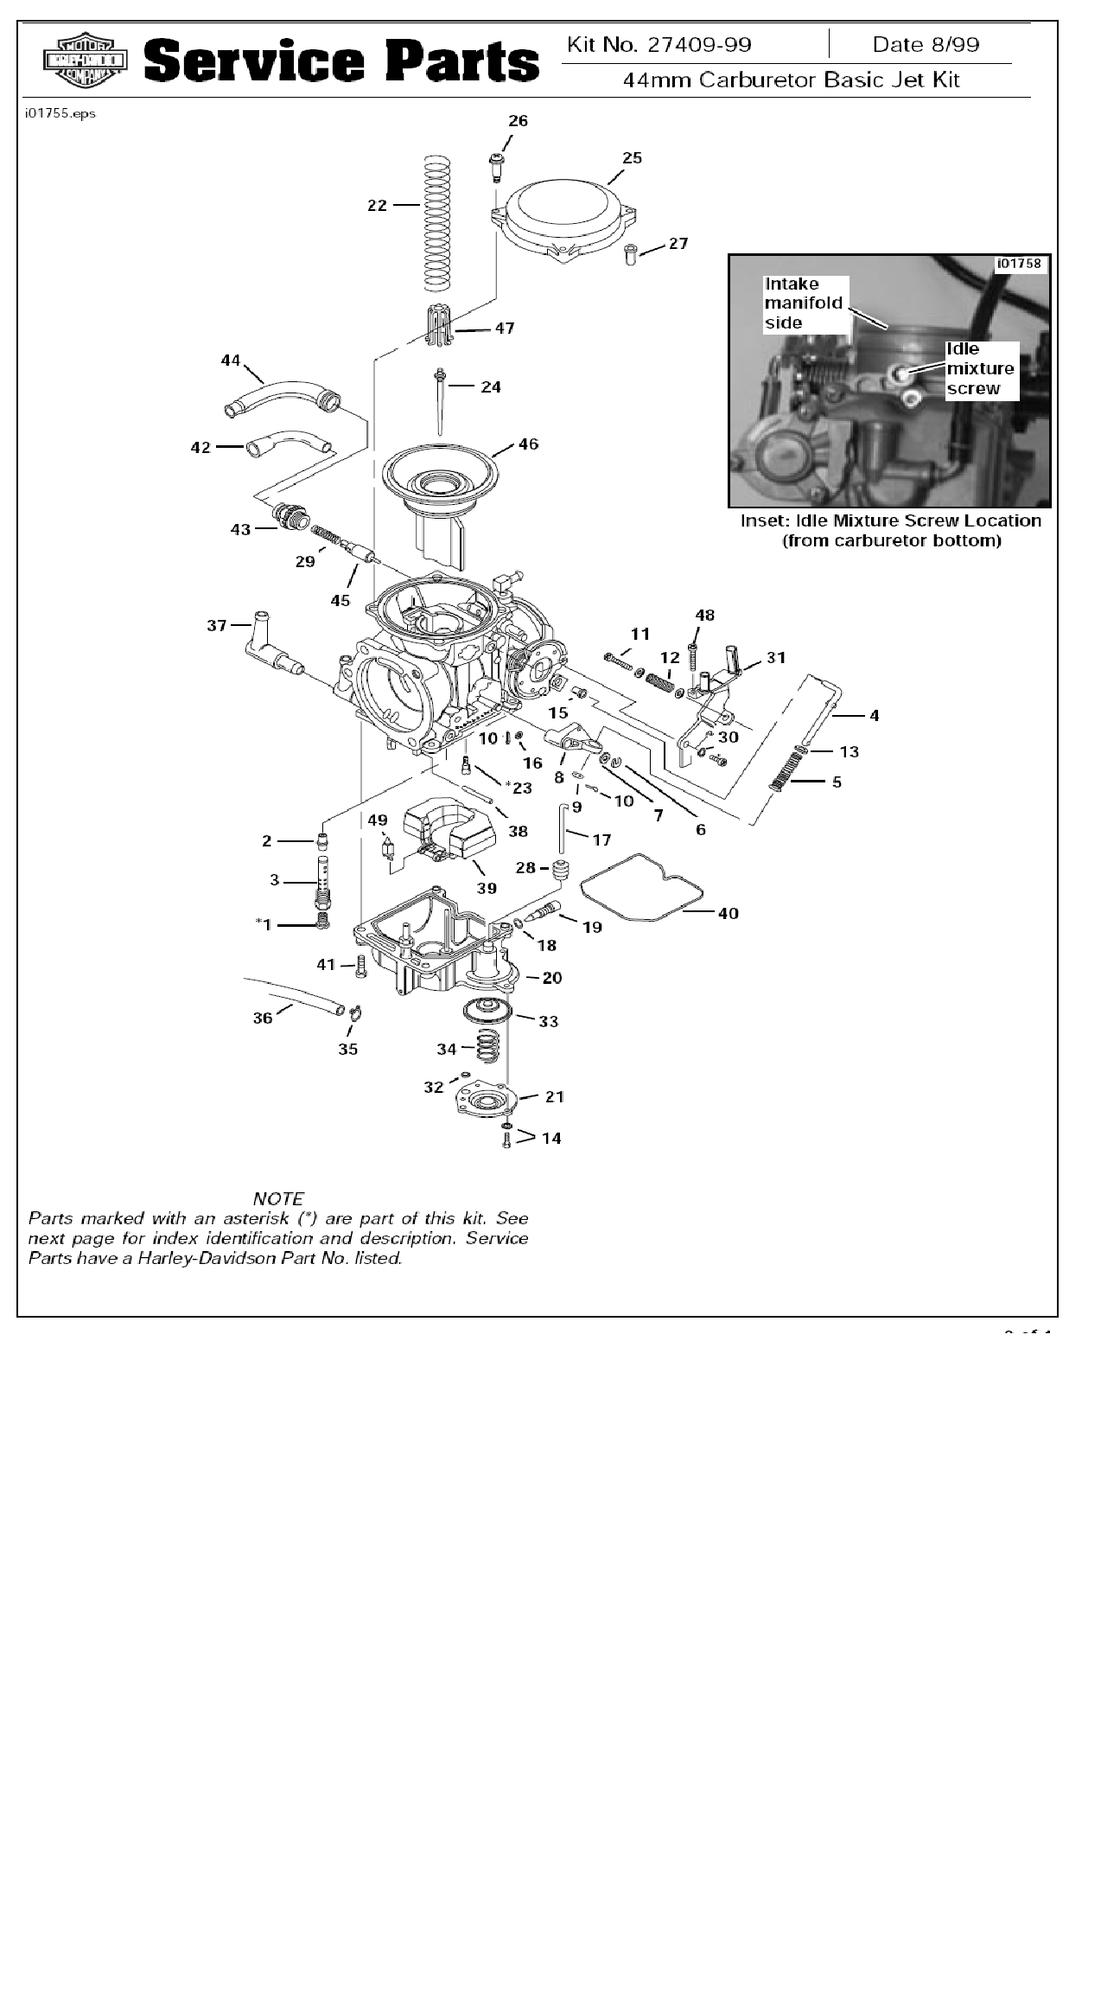 hight resolution of harley fatboy carburetor diagrams wiring diagram expert harley bendix carb diagram 1992 fatboy carburator harley davidson